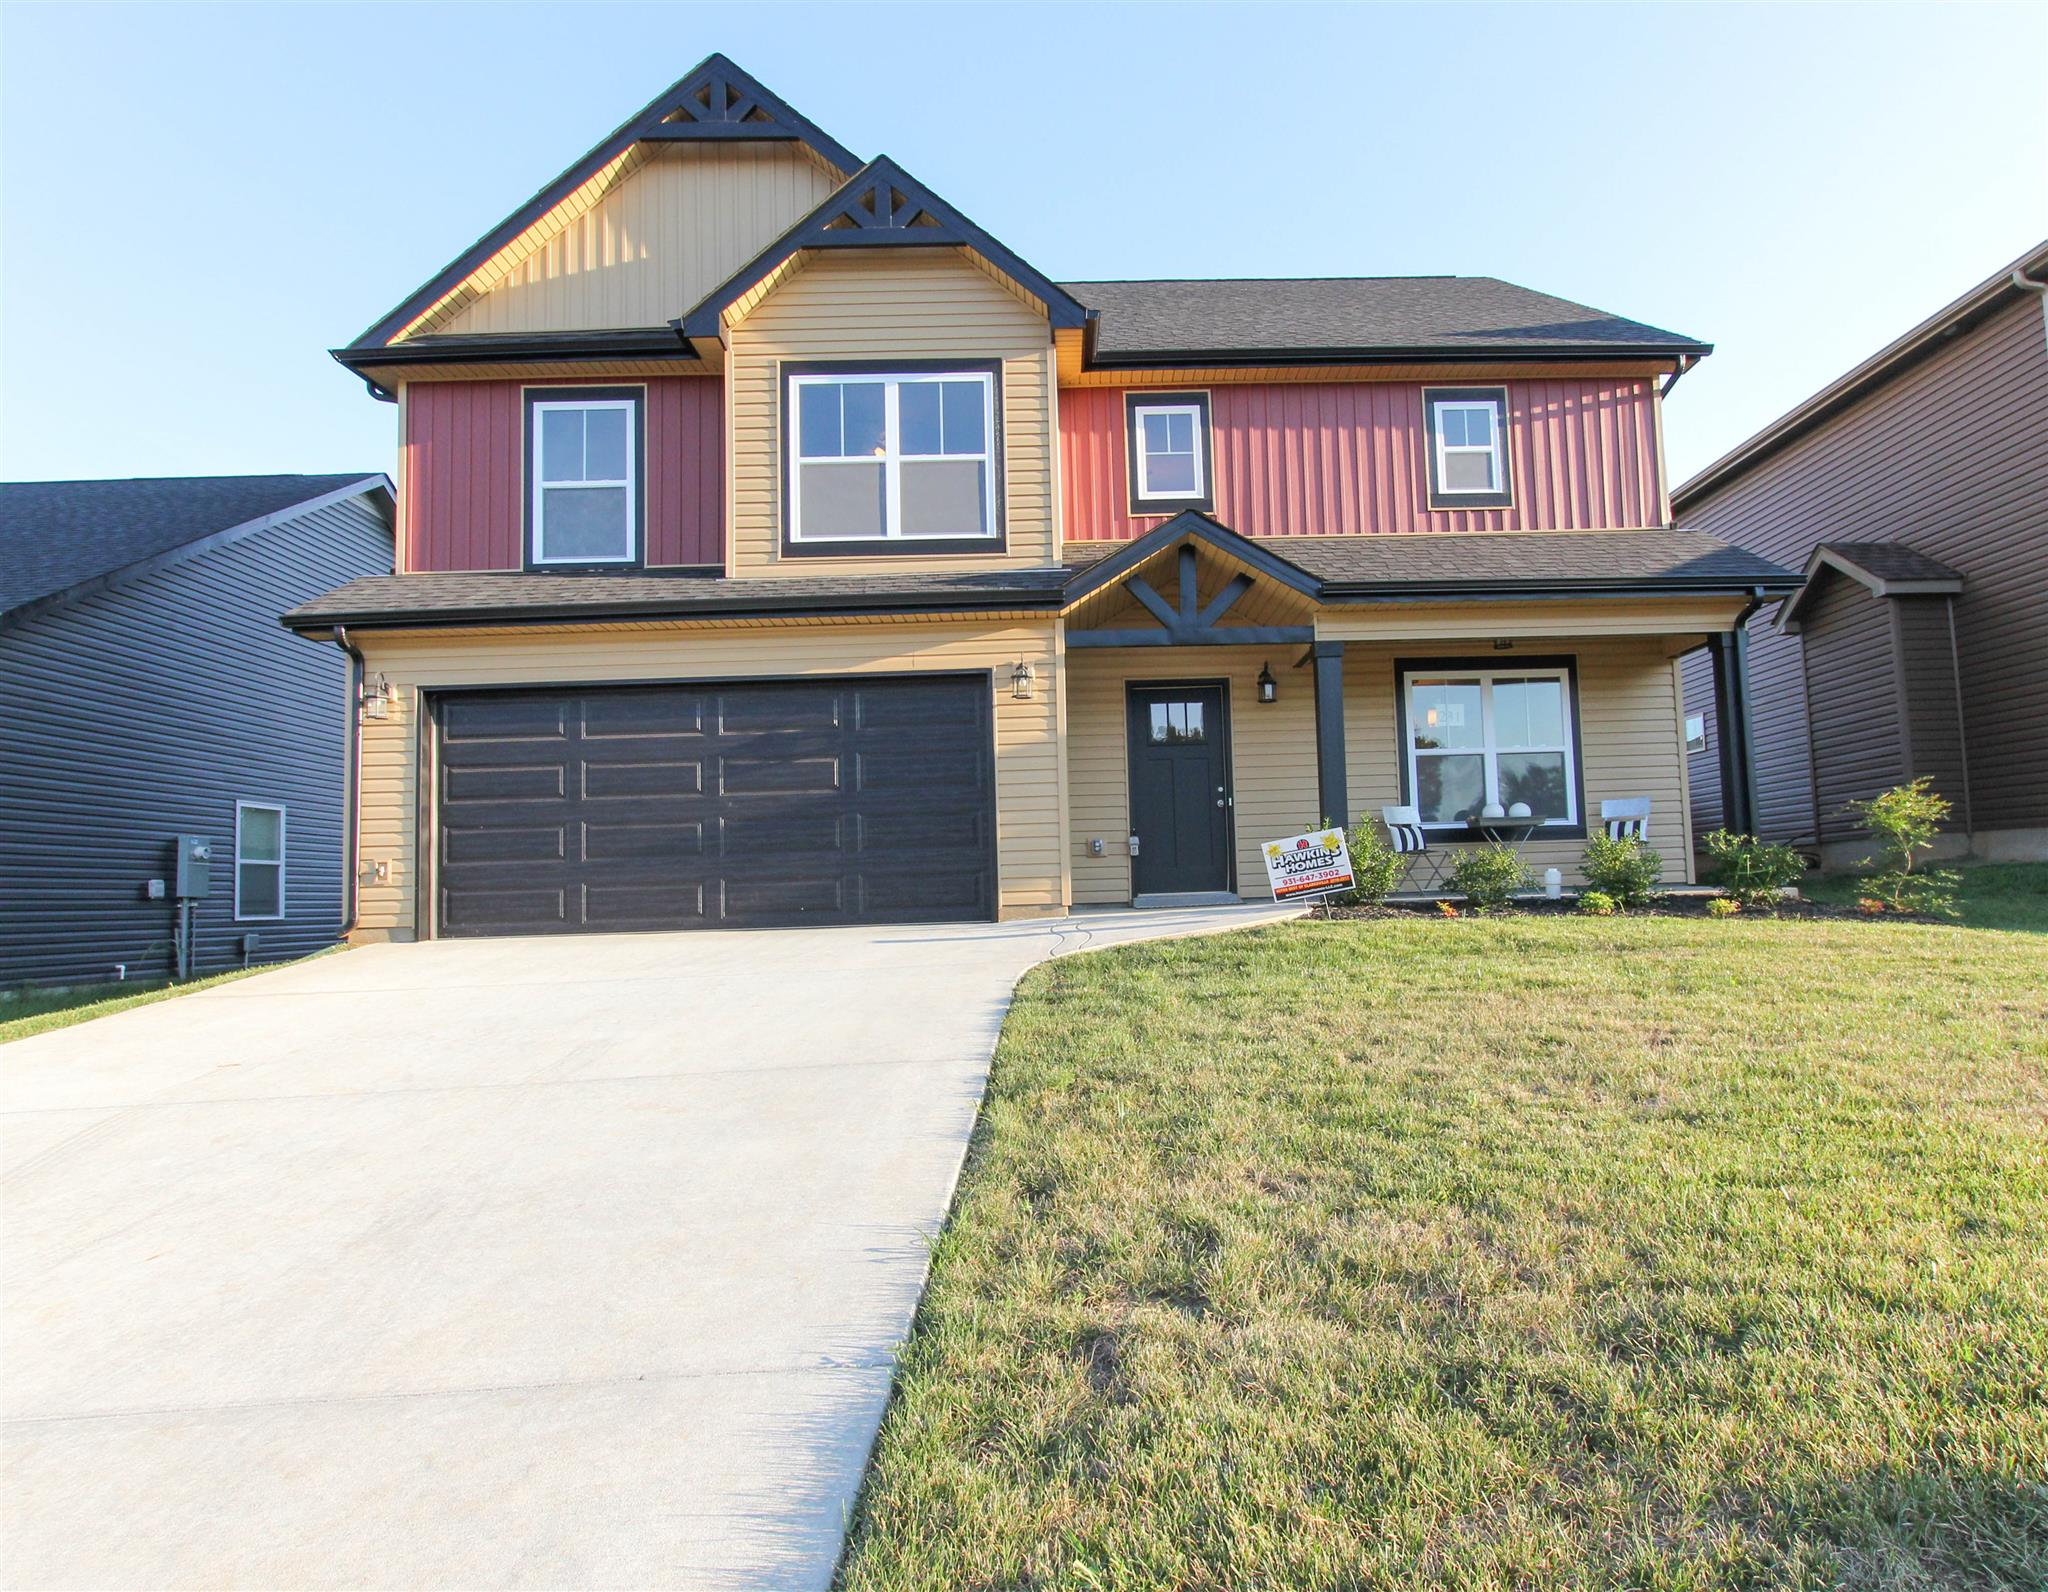 115 Eagles Bluff, Clarksville, TN 37040 - Clarksville, TN real estate listing